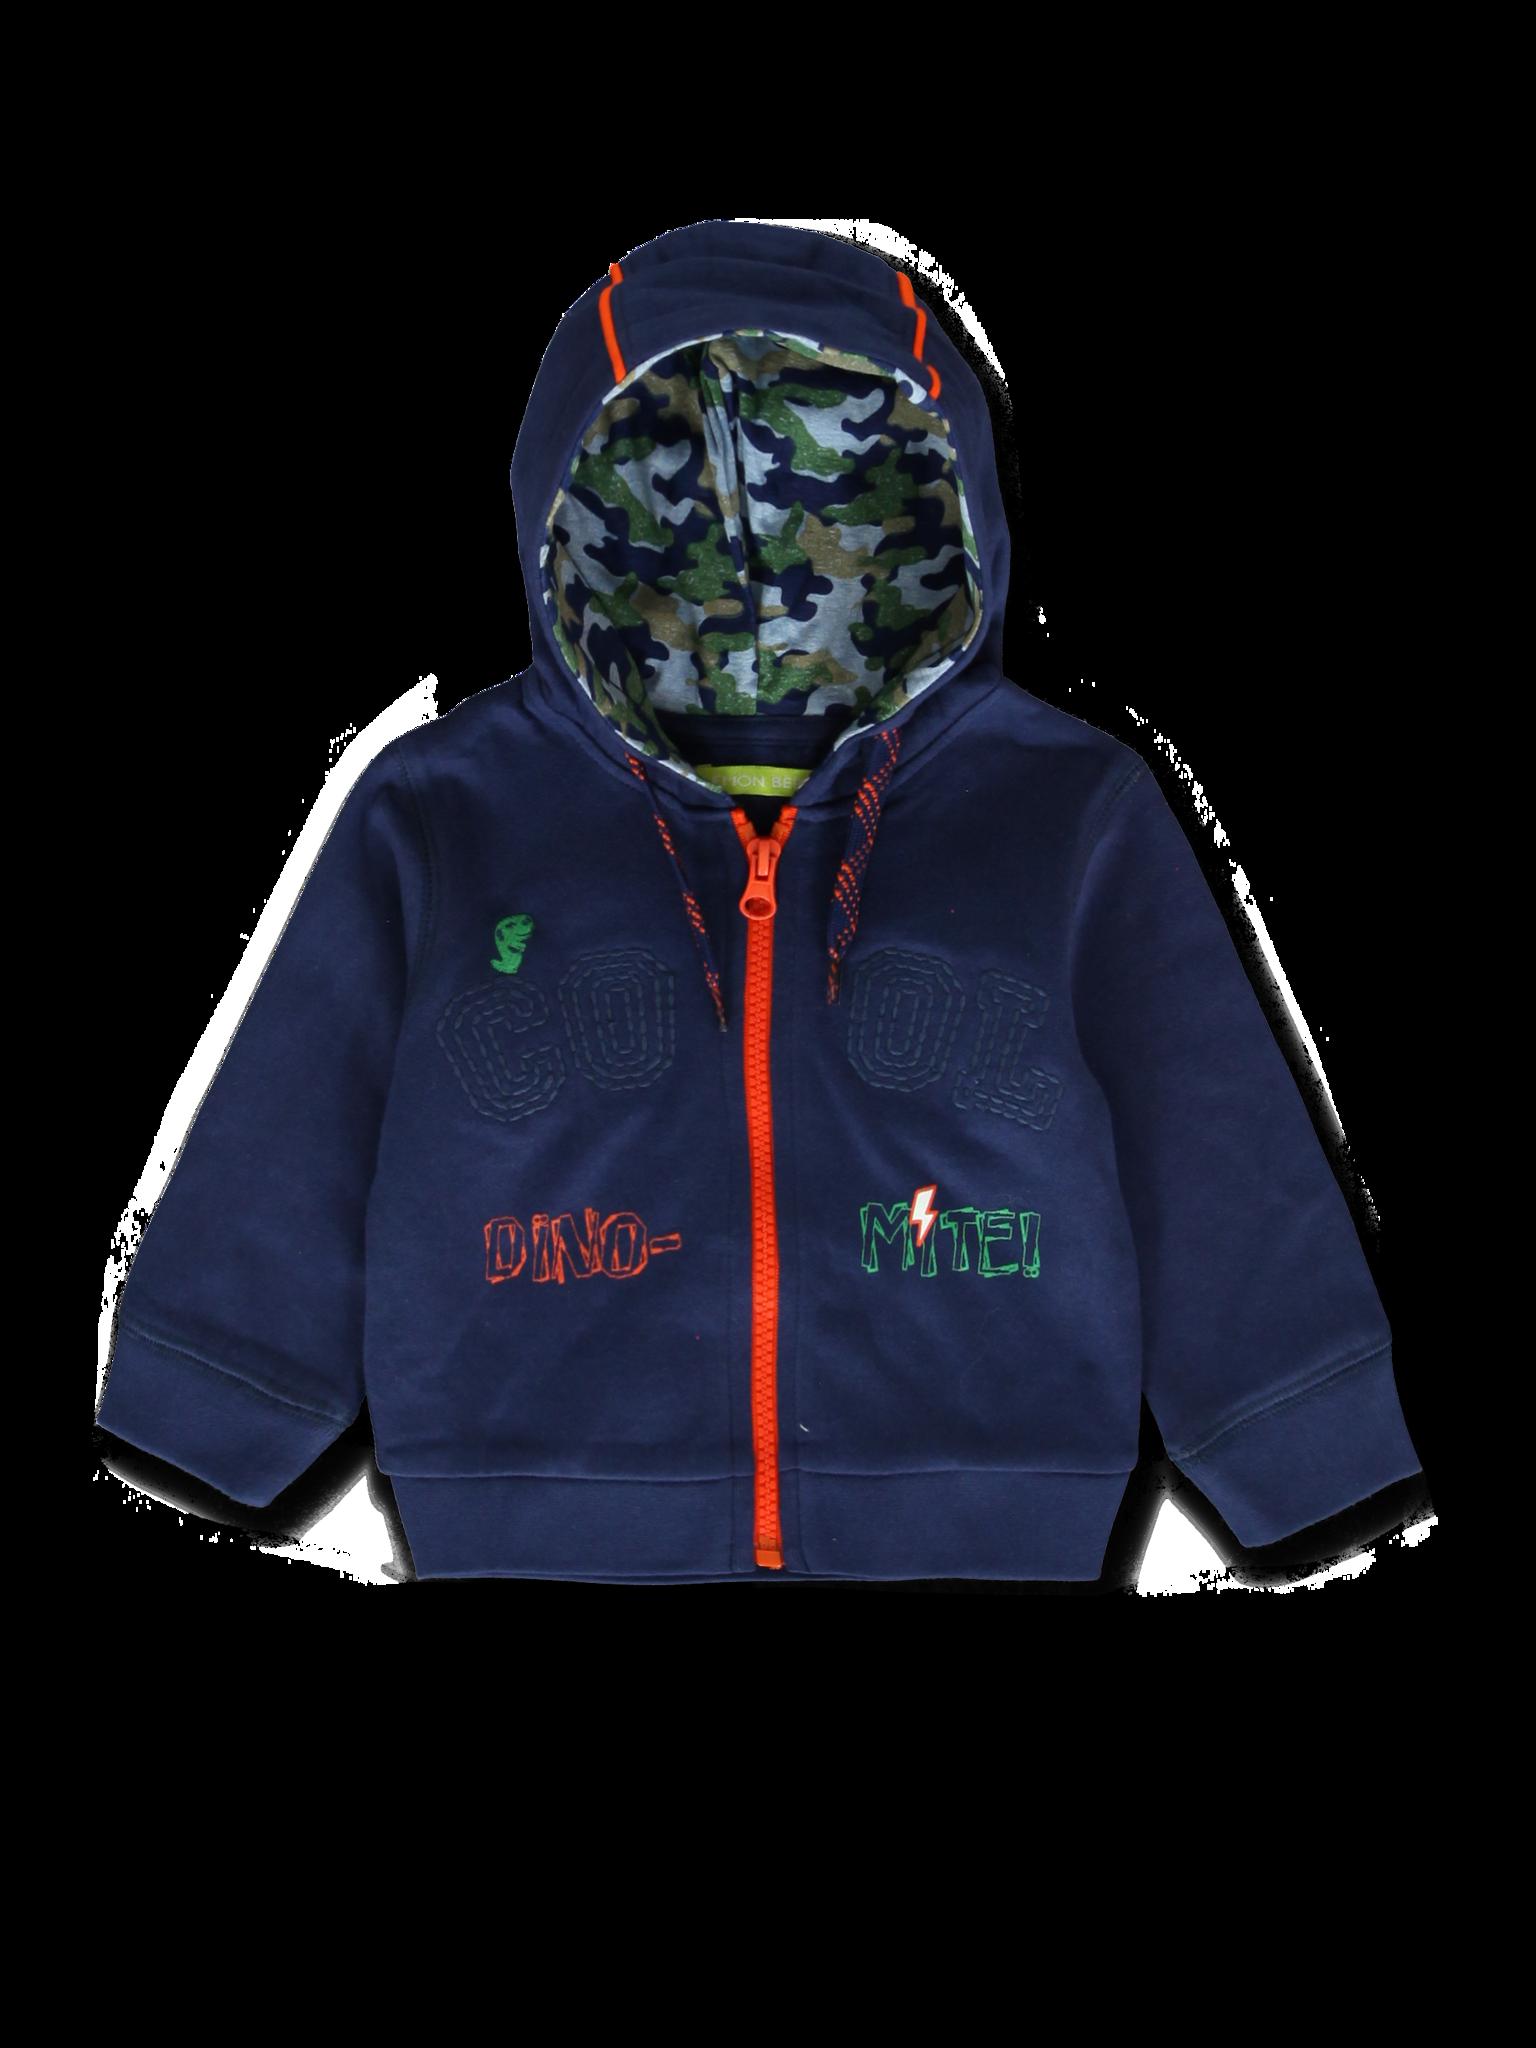 All Brands | Winterproducts Baby | Cardigan Sweater | 8 pcs/box